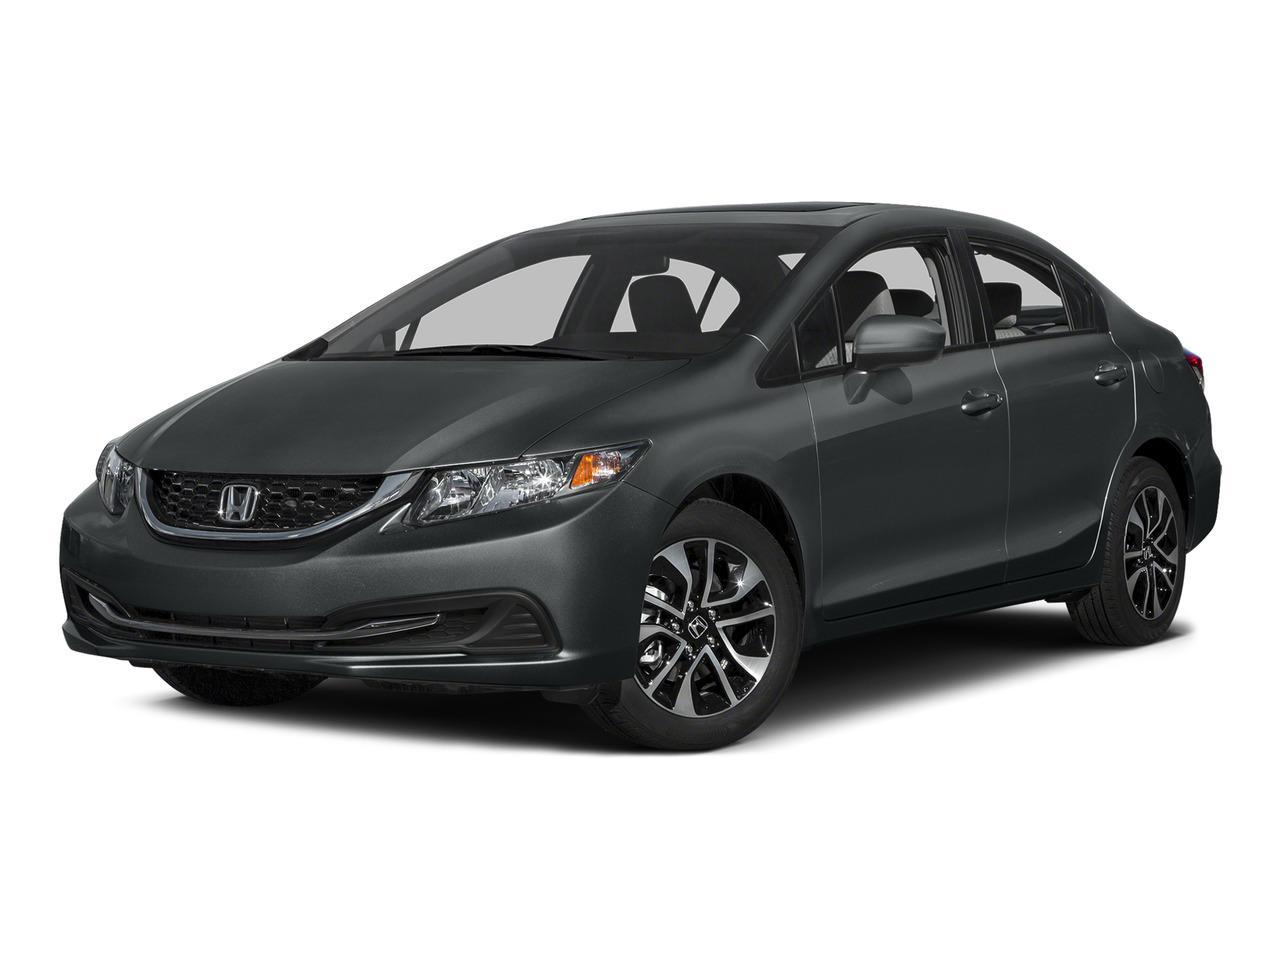 2015 Honda Civic Sedan Vehicle Photo in Muncy, PA 17756